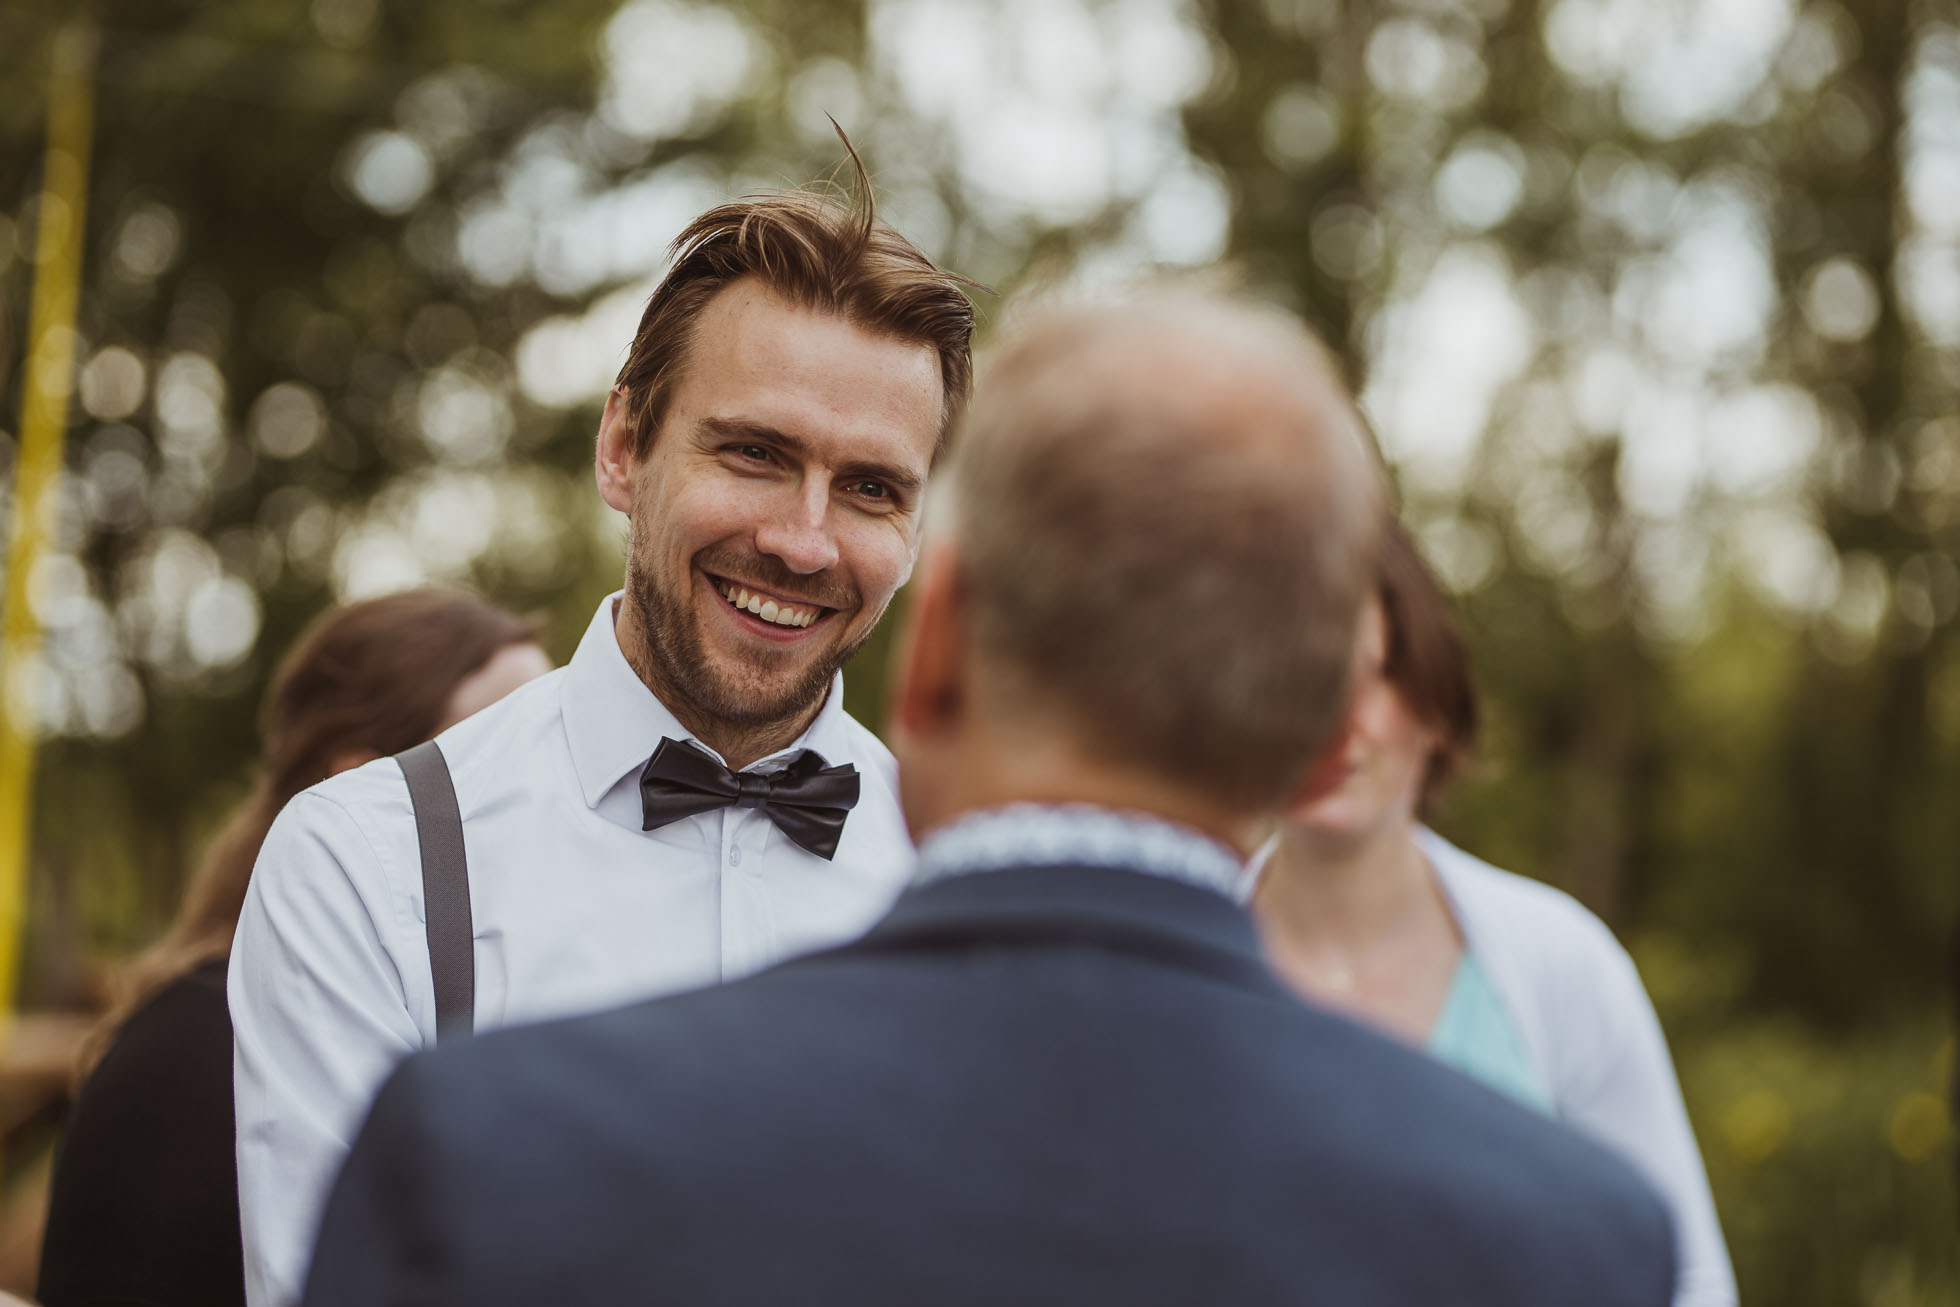 utrecht-wedding-photographer-83.jpg